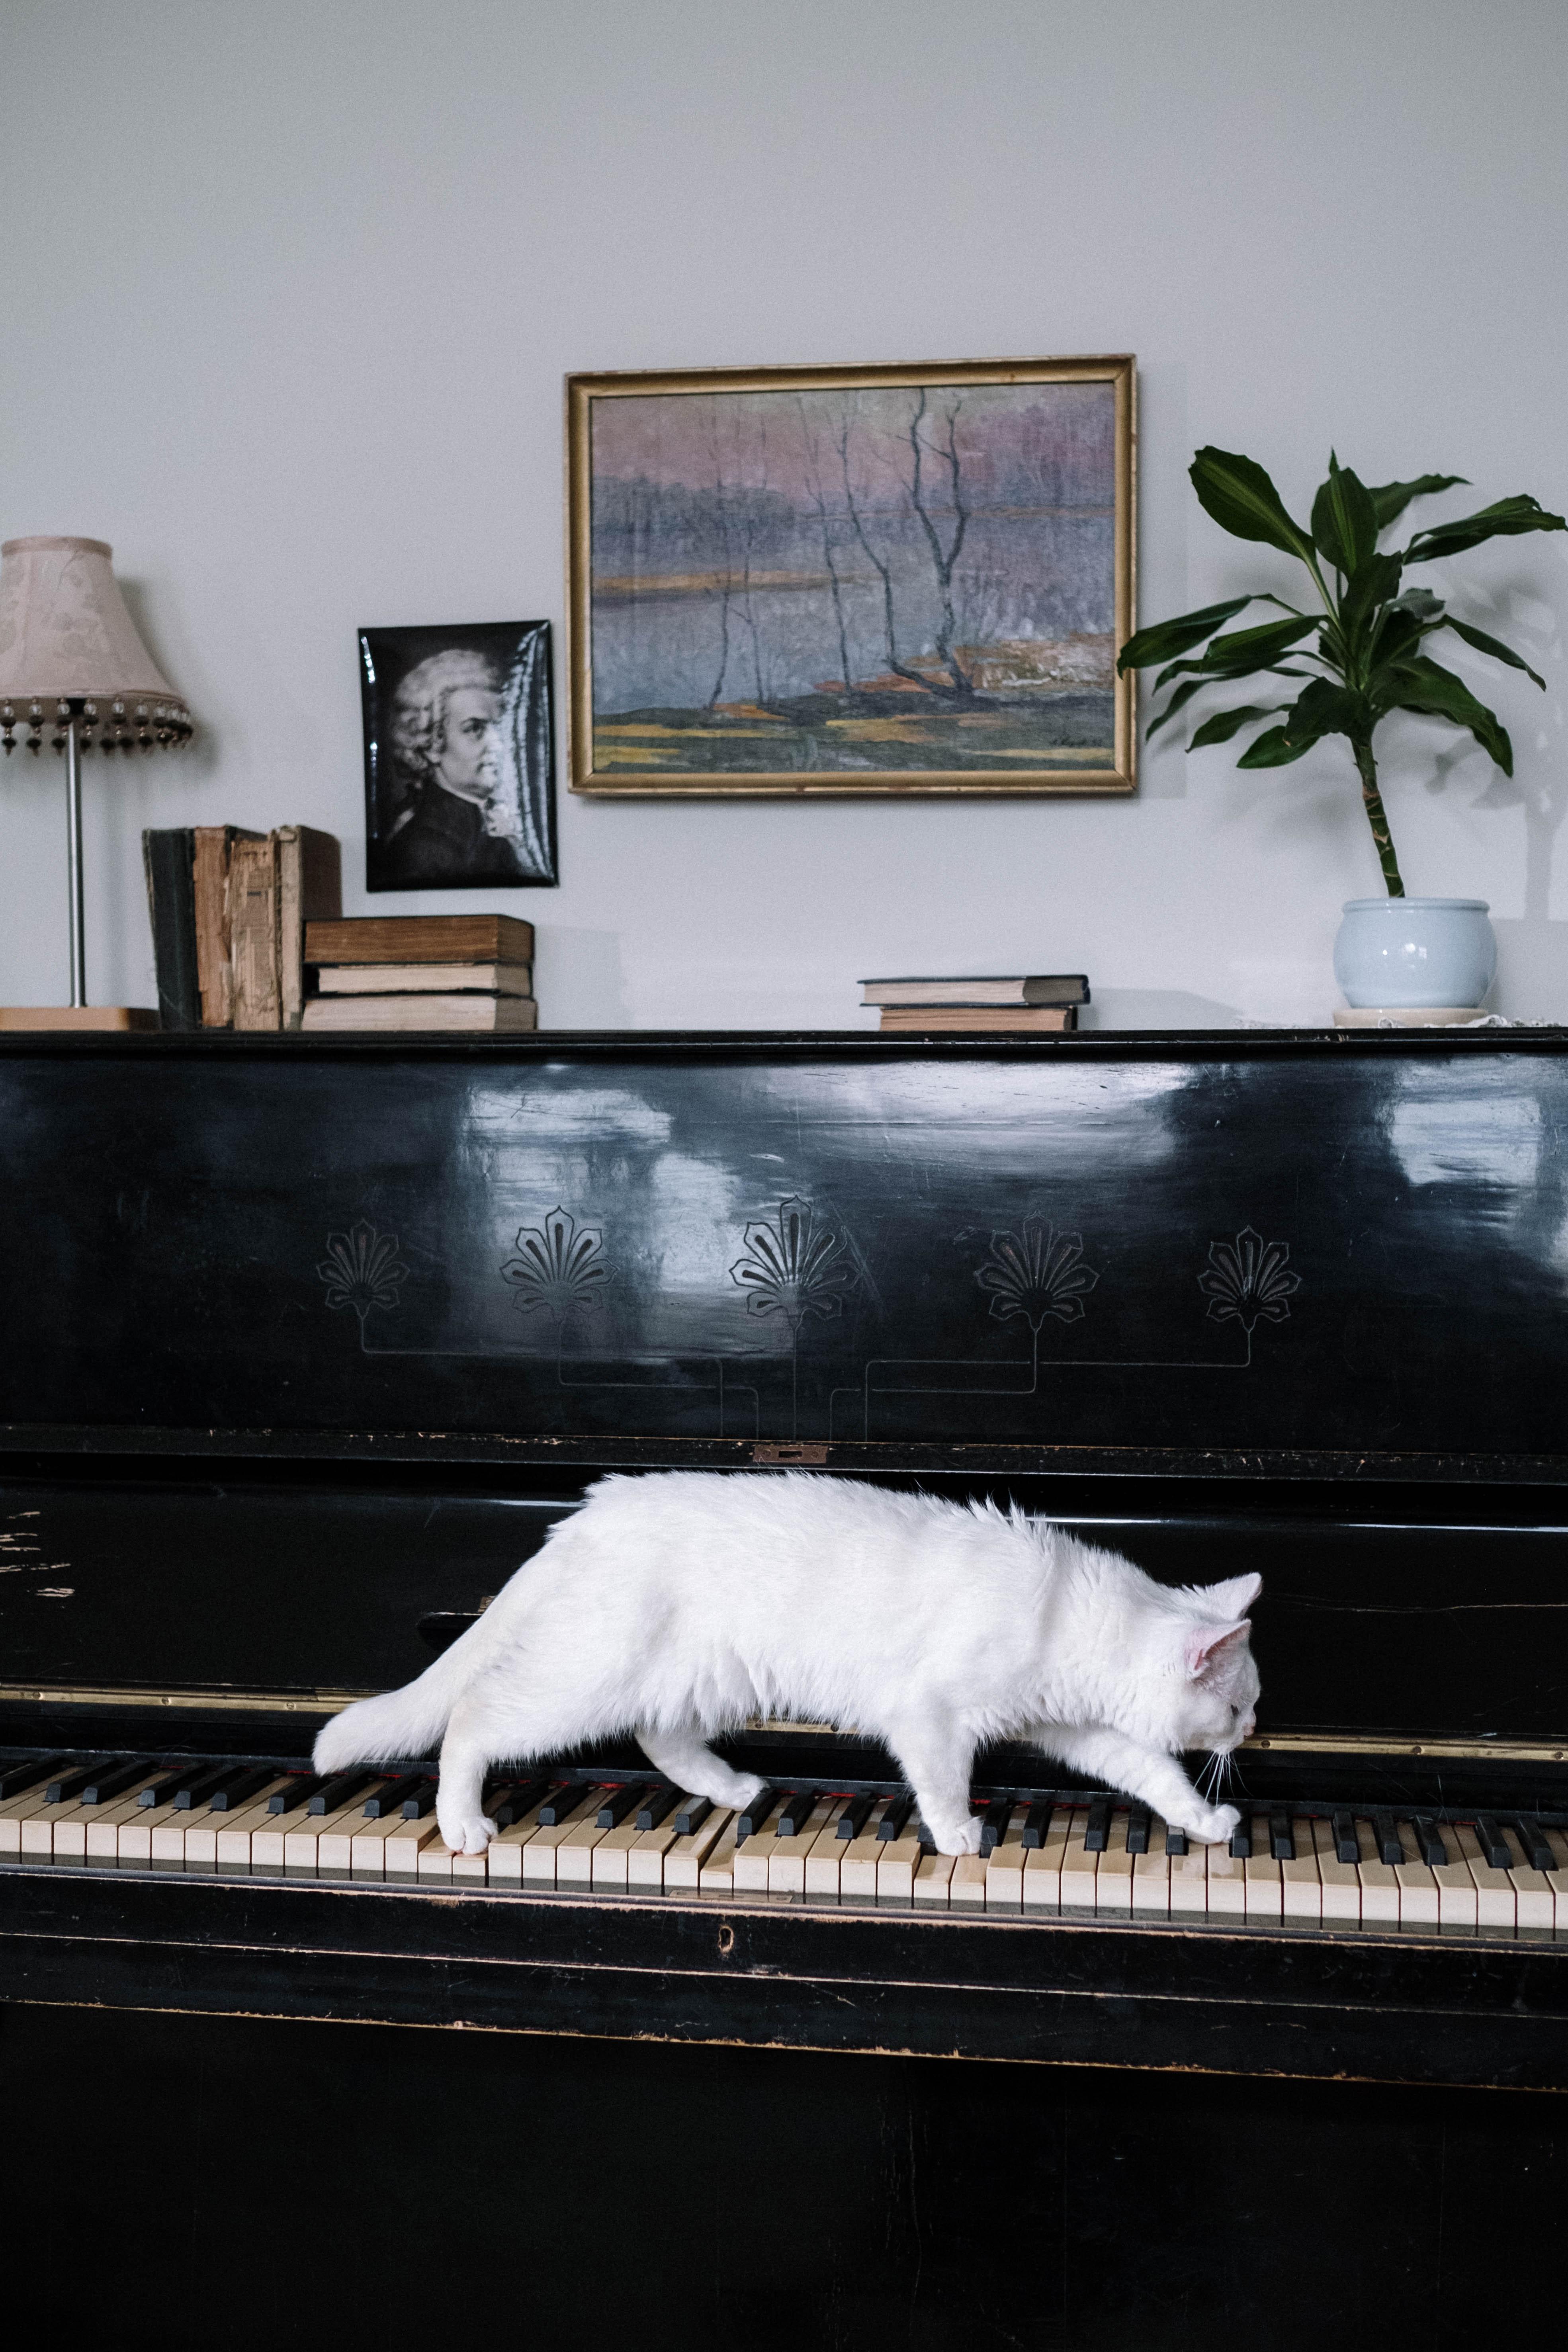 White cat walking on keyboard of upright piano.